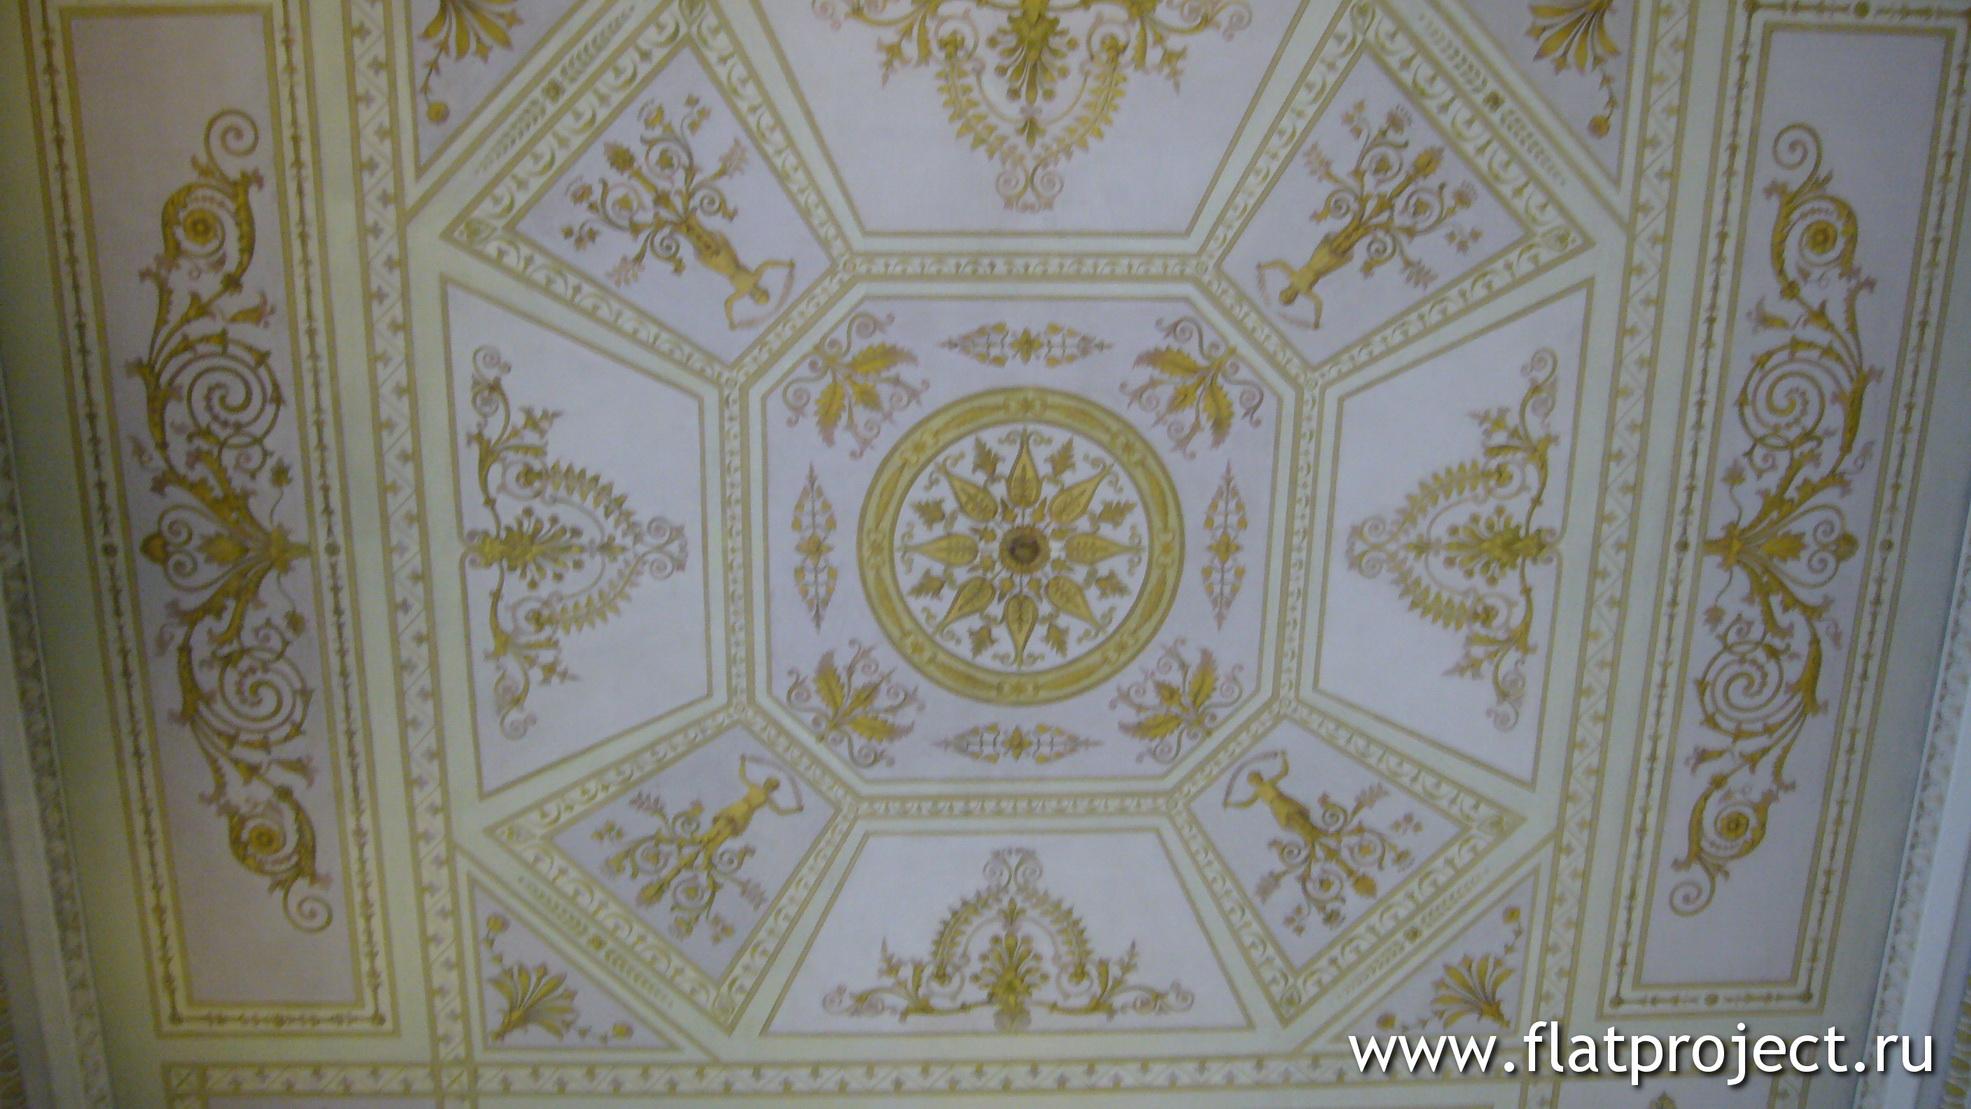 The State Hermitage museum interiors – photo 221